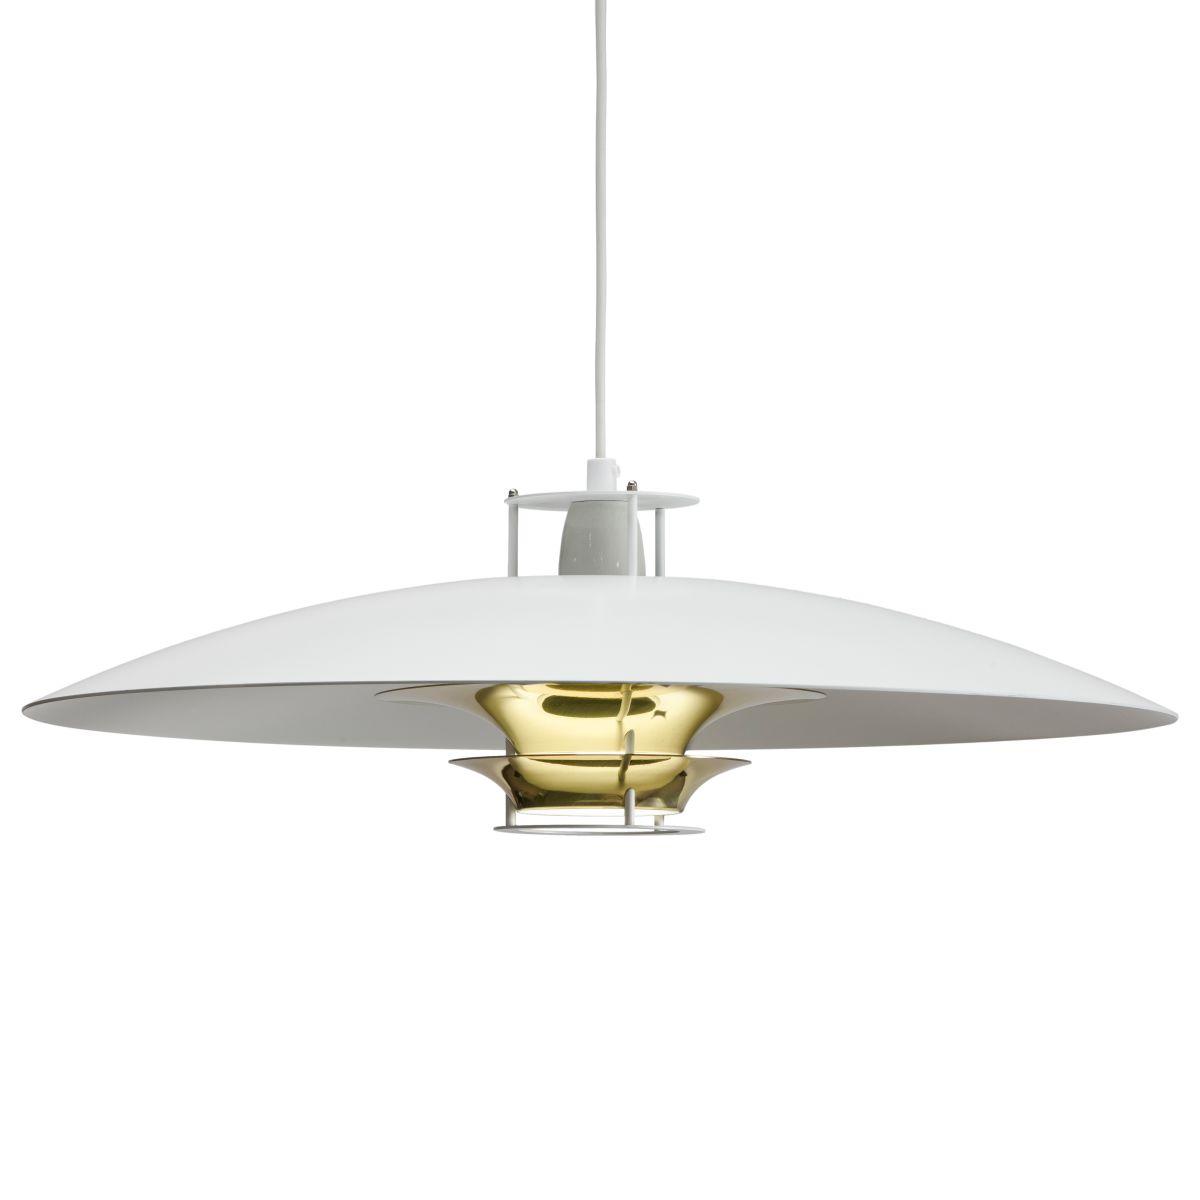 Pendant_Lamp_Jl341_Reflectors_Brass-2081403